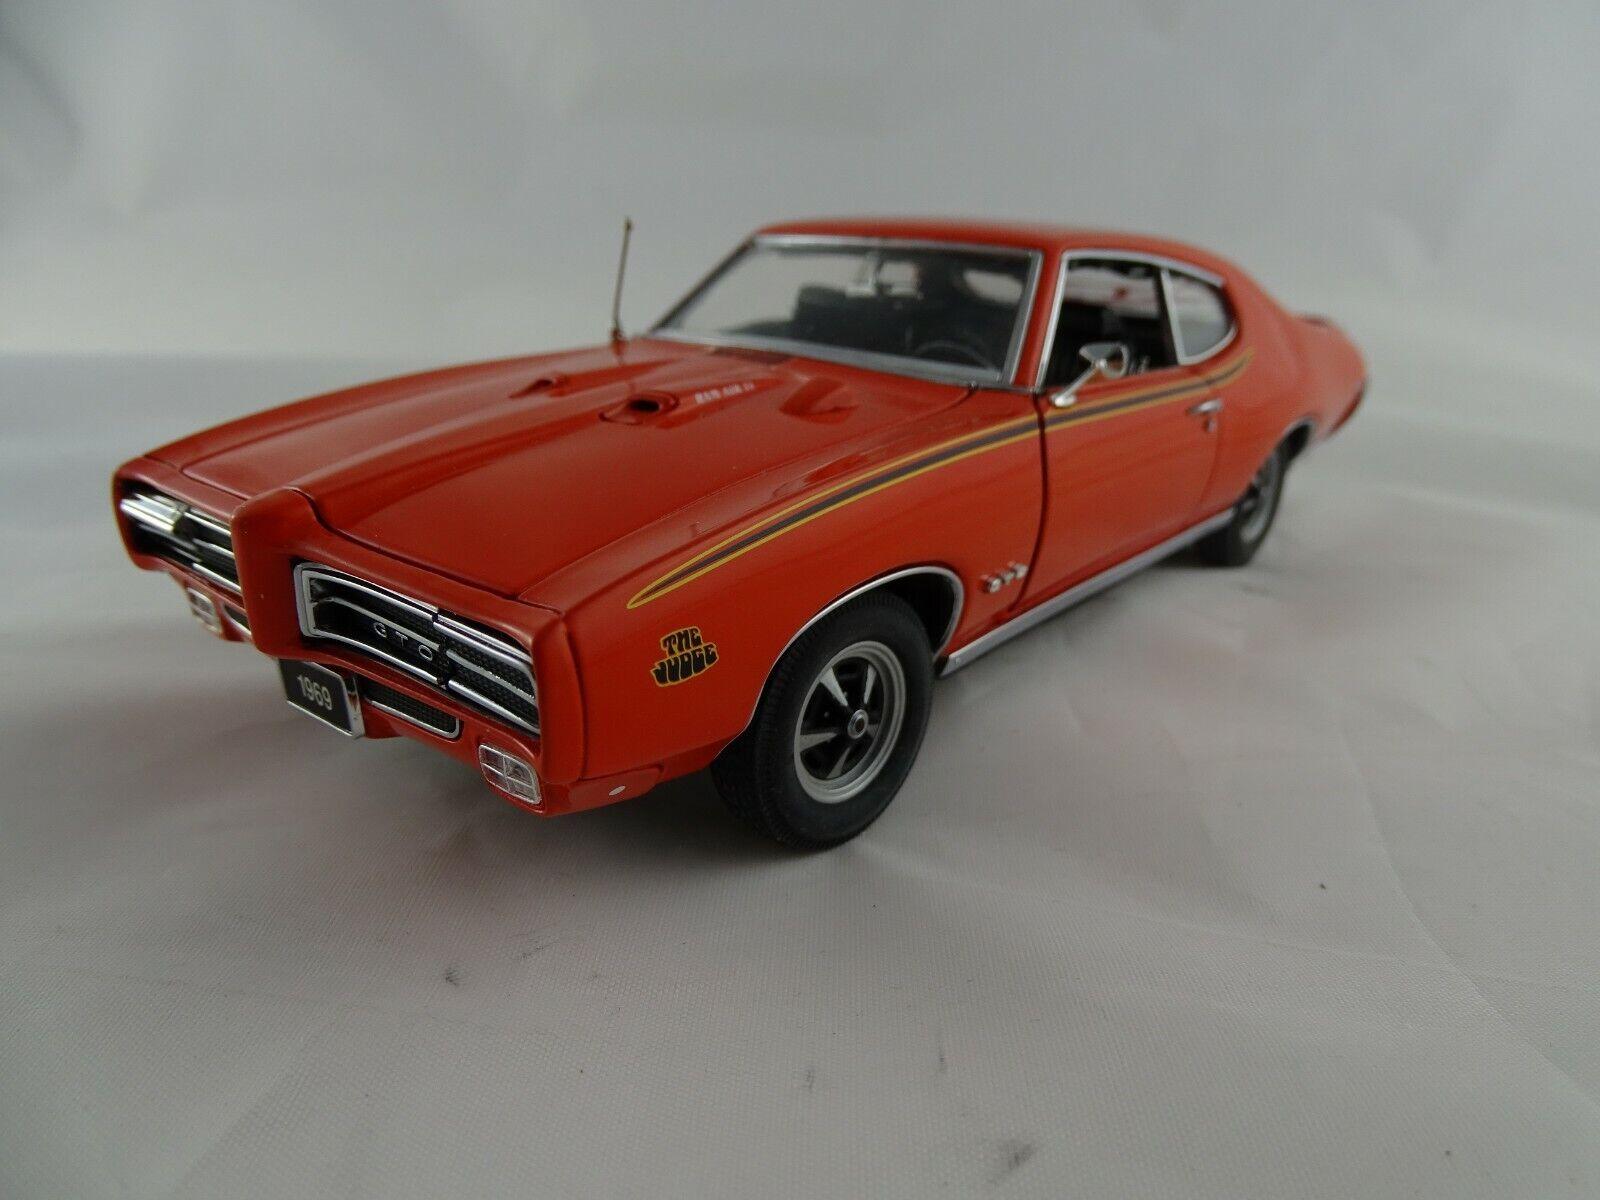 1 24 Danbury Mint 1969 Pontiac GTO Judge 1969 Orange